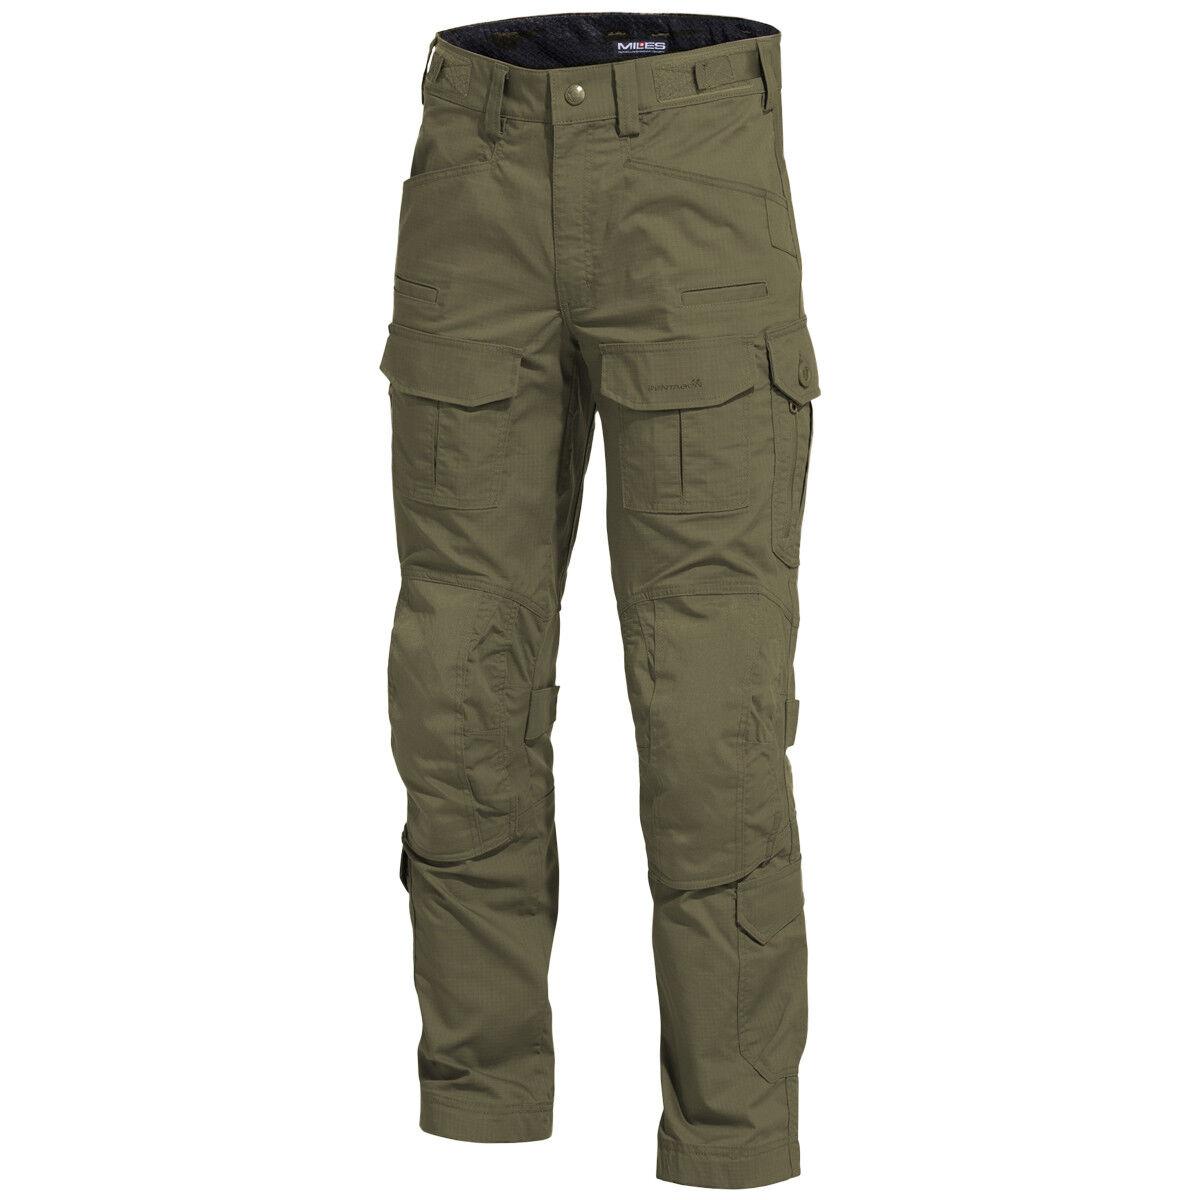 Pentagon Wolf Combat Pants Military Army Teflon Cordura Comfortable Ranger Green